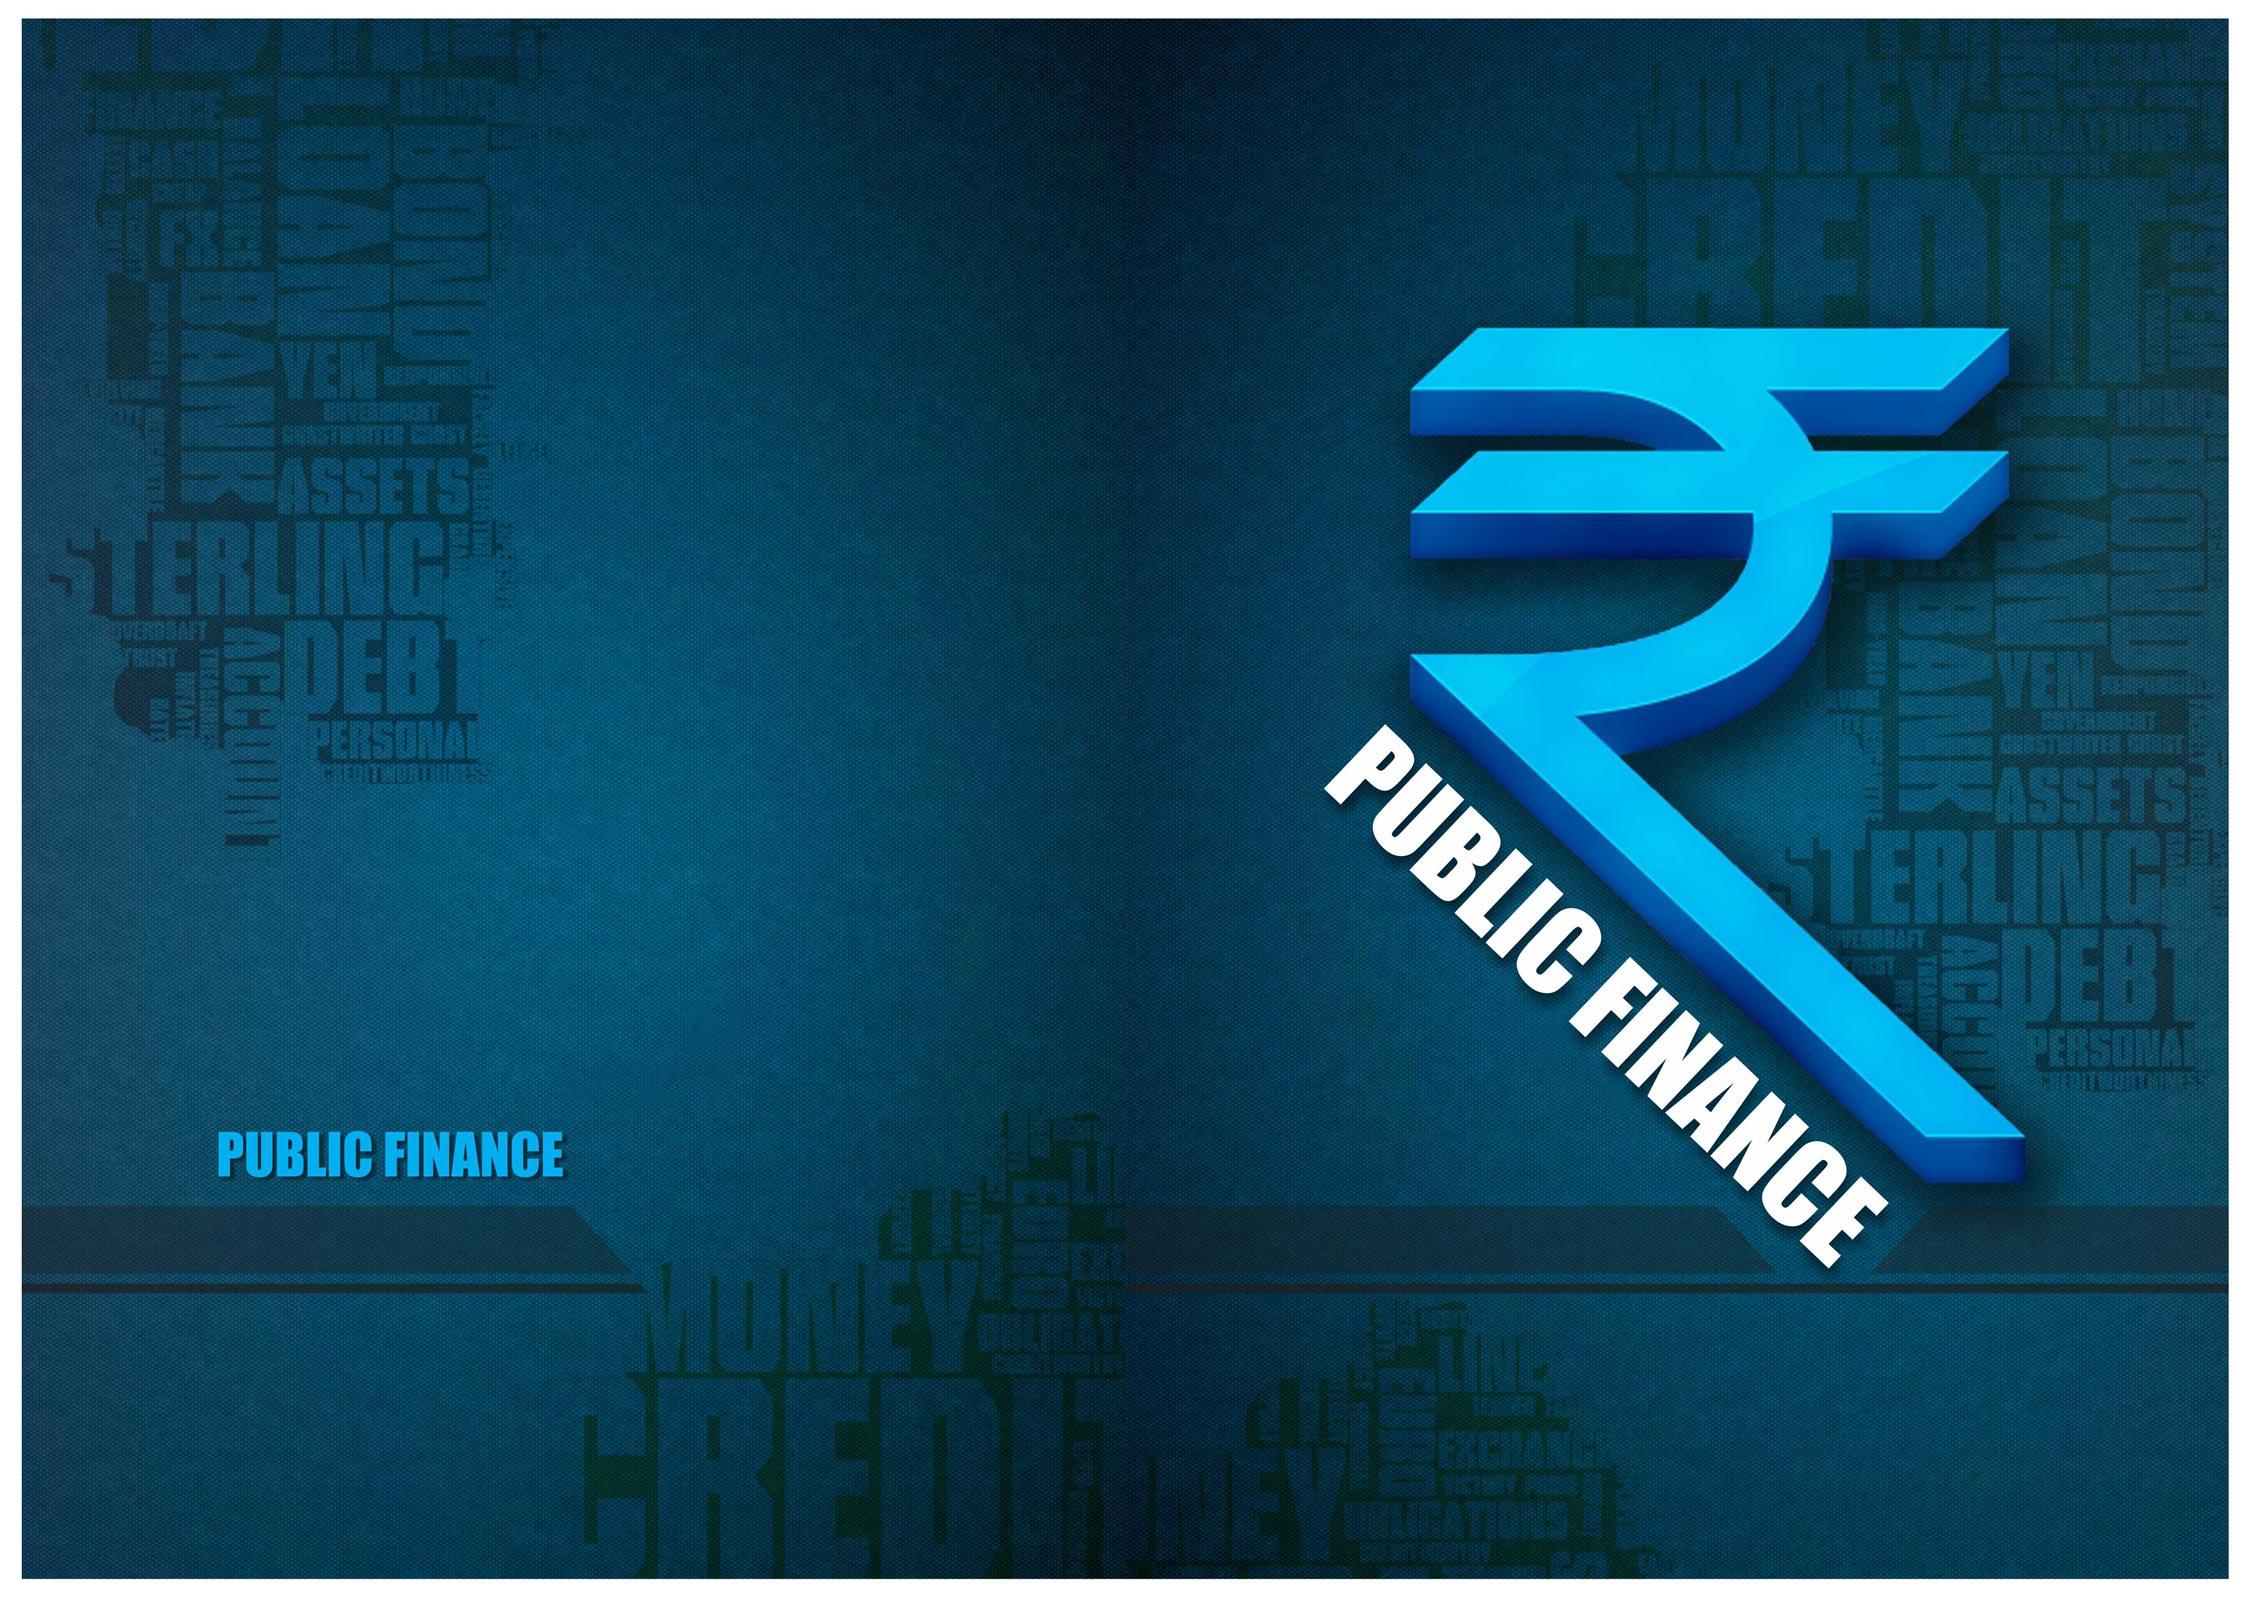 public-finance-business-graphic-design